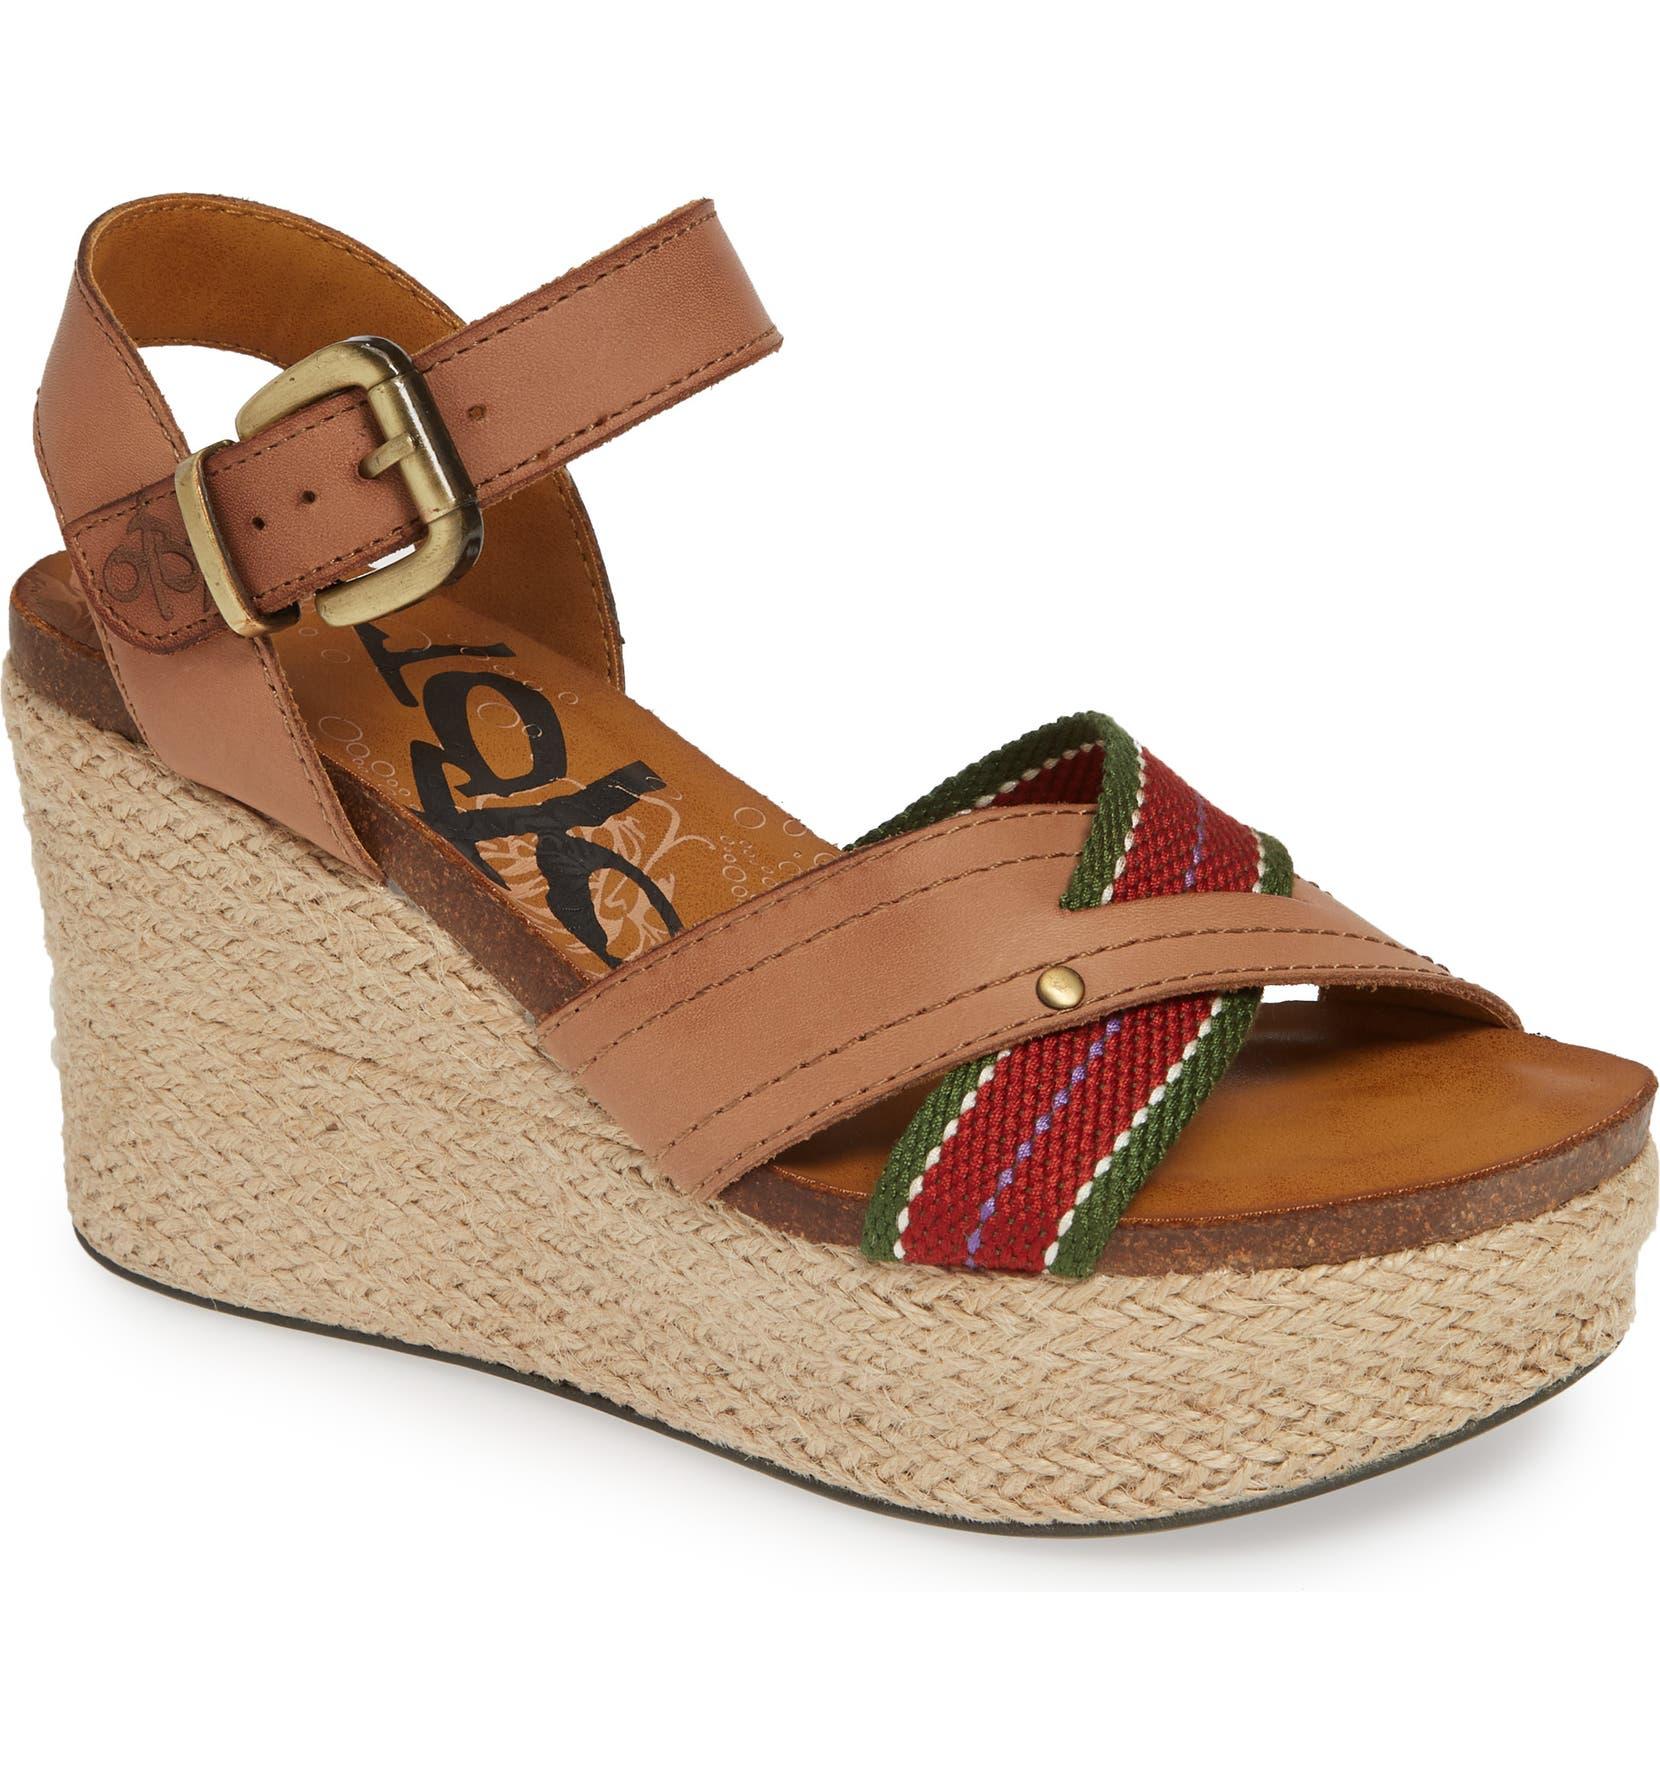 d18b89fa255 OTBT Topsail Platform Wedge Sandal (Women)